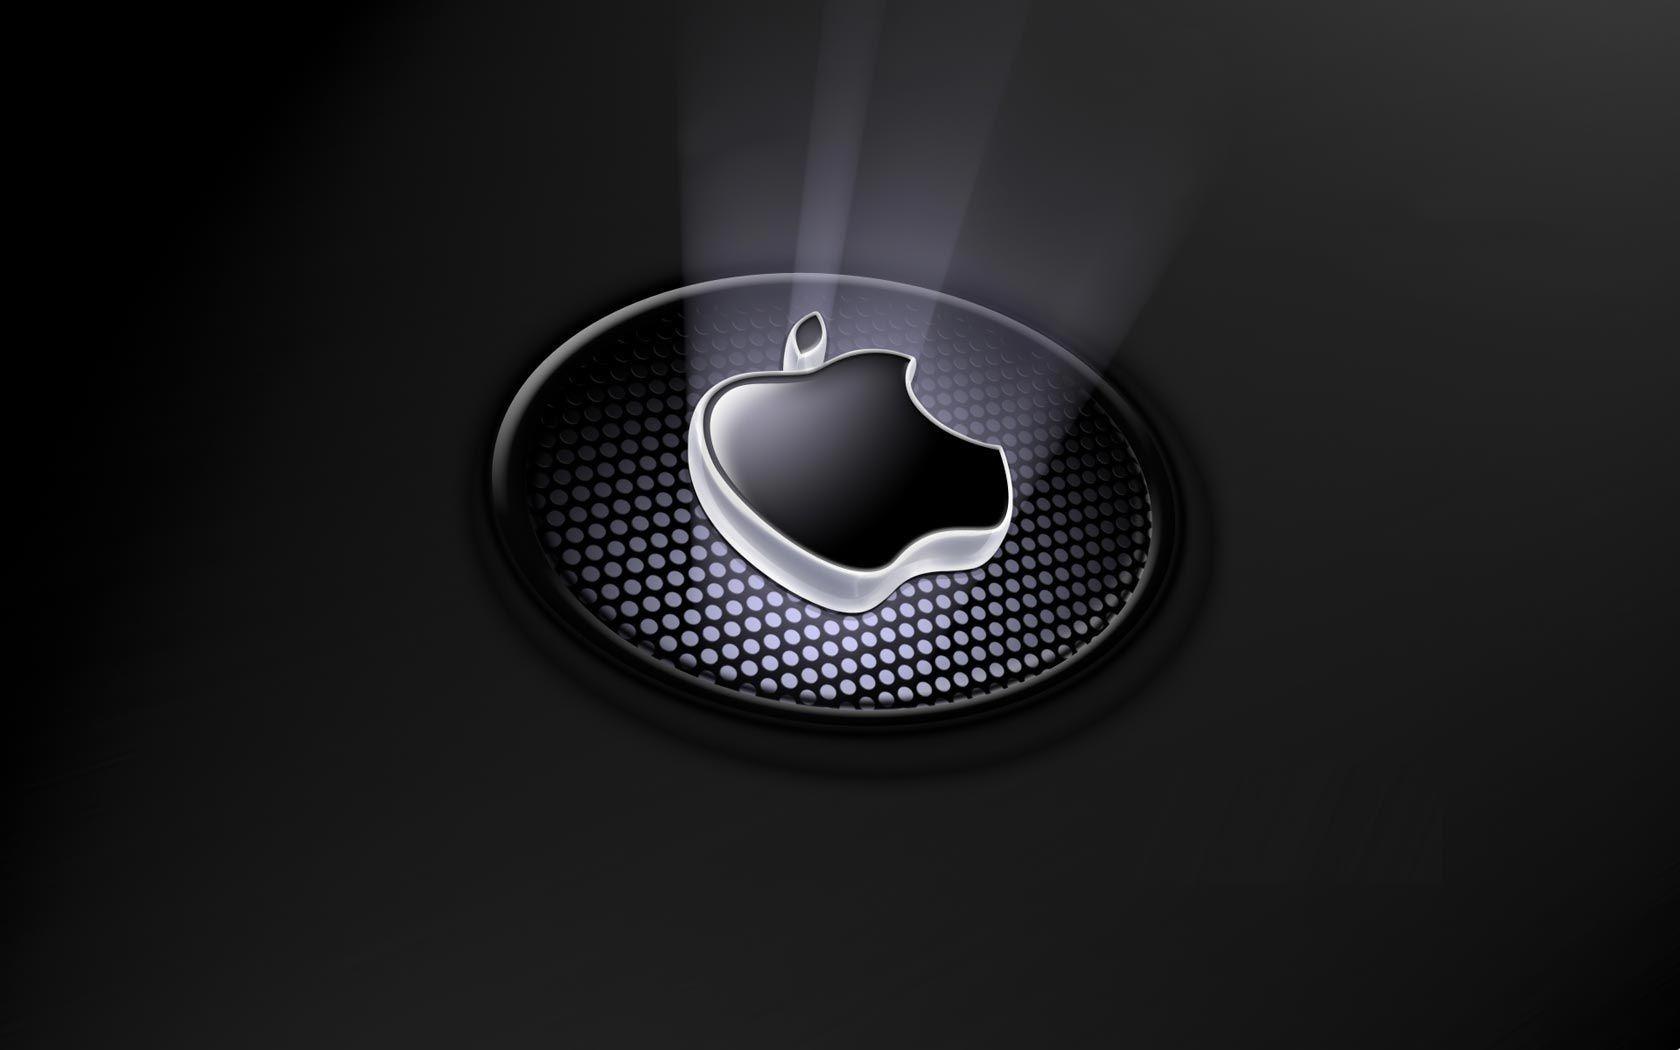 HD Apple Wallpapers Find Best Latest HD Apple Wallpapers